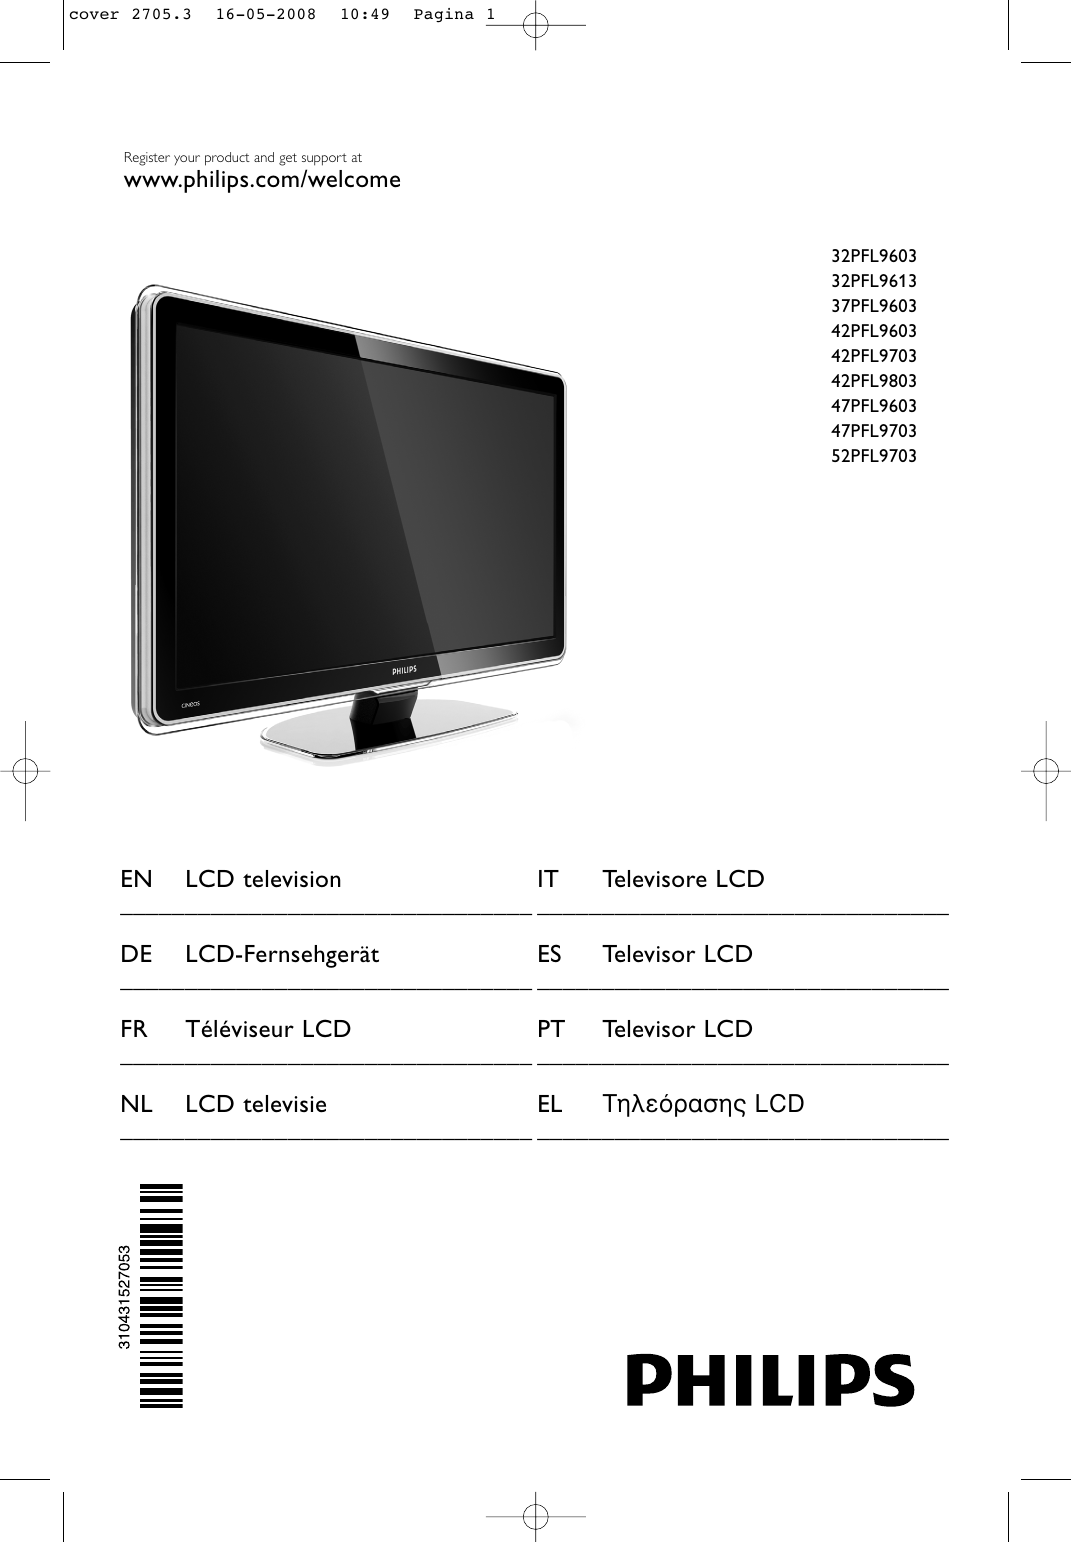 aab625f02 Philips 42PFL9803H/10 2705.3 PT User Manual Bedienungsanleitung 42pfl9803h  10 Dfu Por